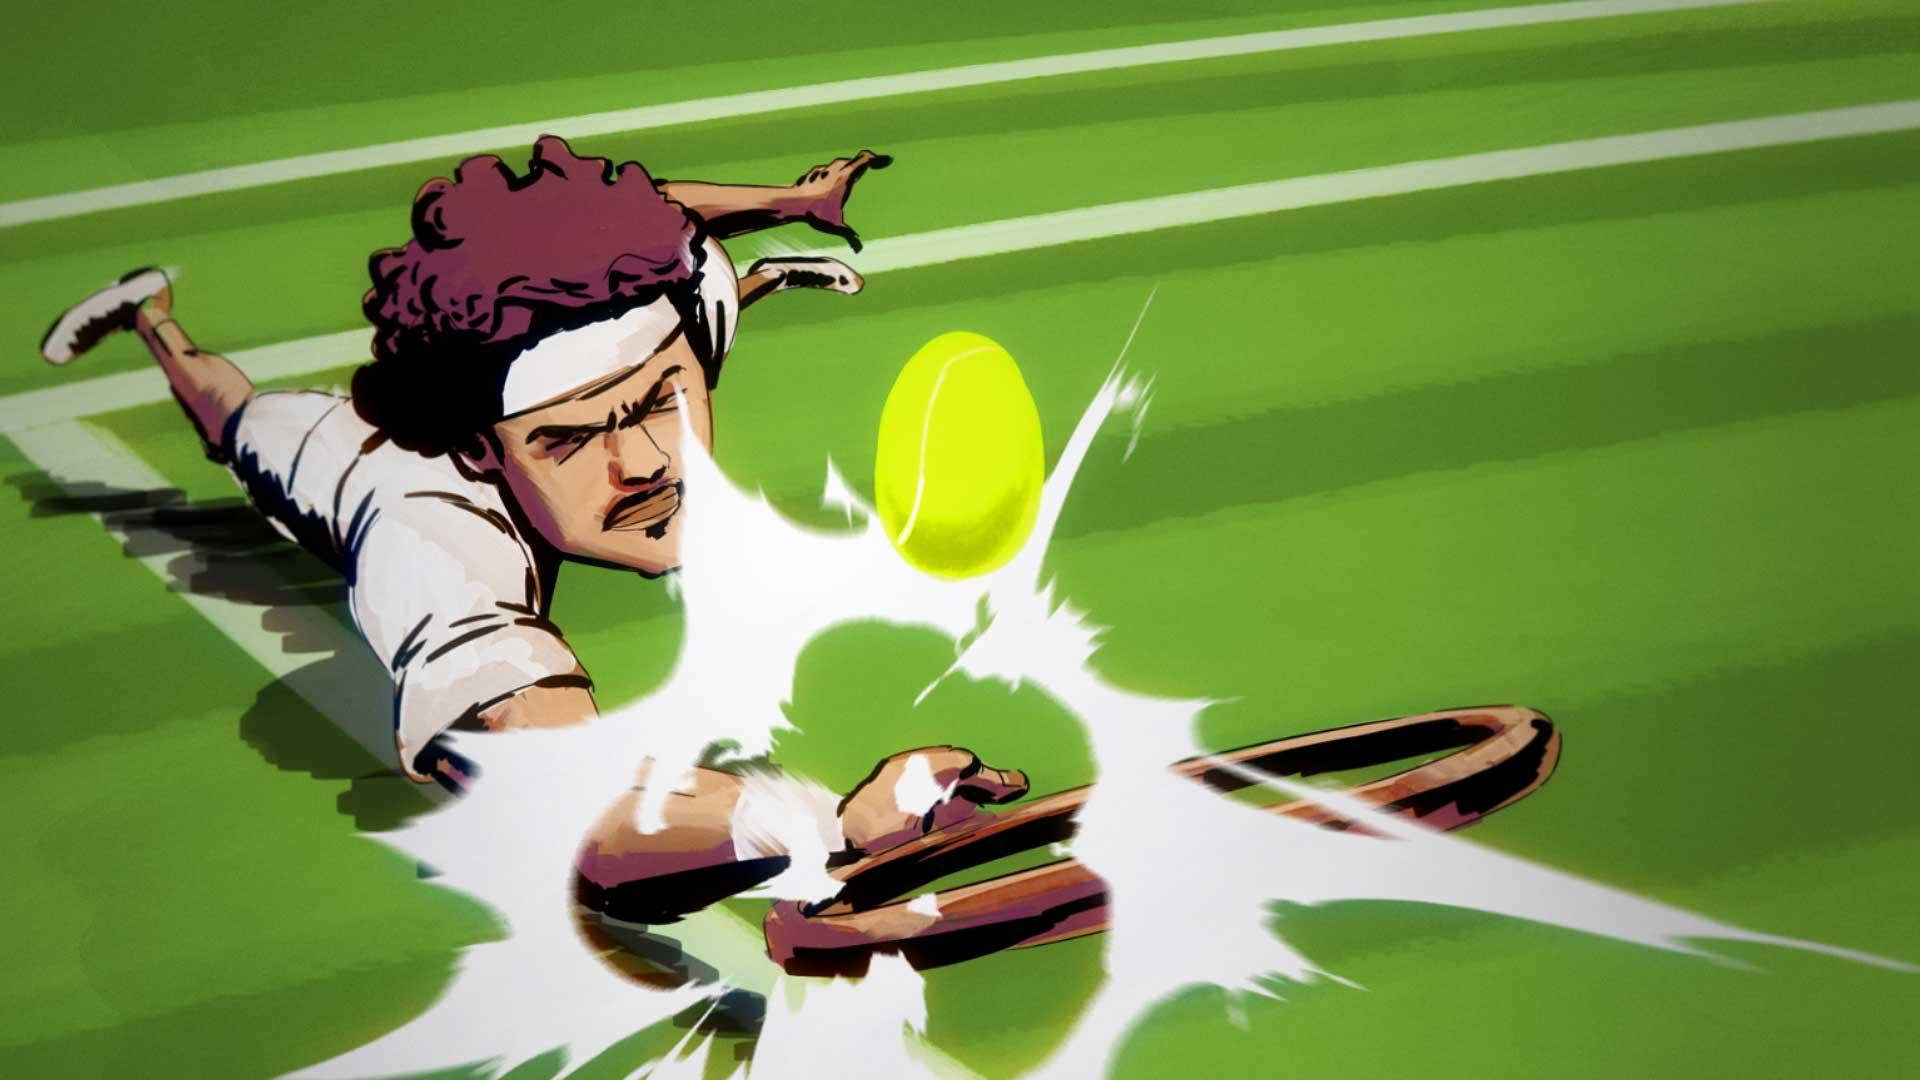 Wimbledon2019_EVAN_30s_25fps_v4j.jpg